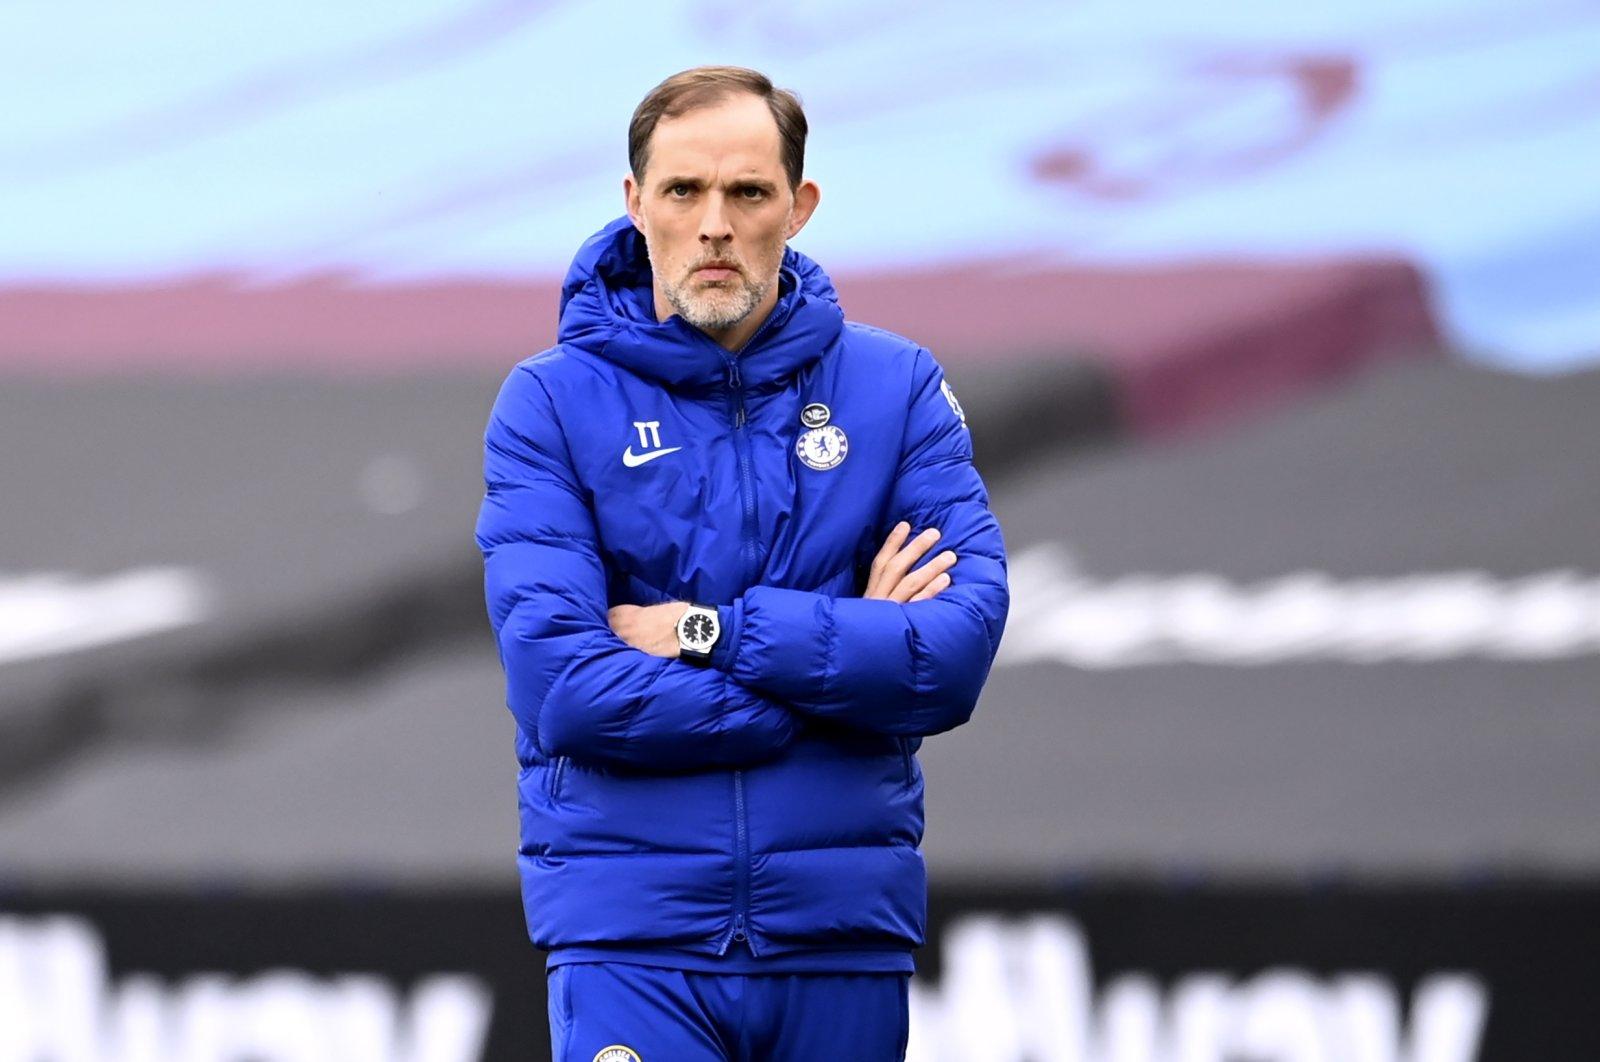 Chelsea coach Thomas Tuchel reacts during a Premier League match against West Ham United, in London, Britain, April 24, 2021. (EPA Photo)